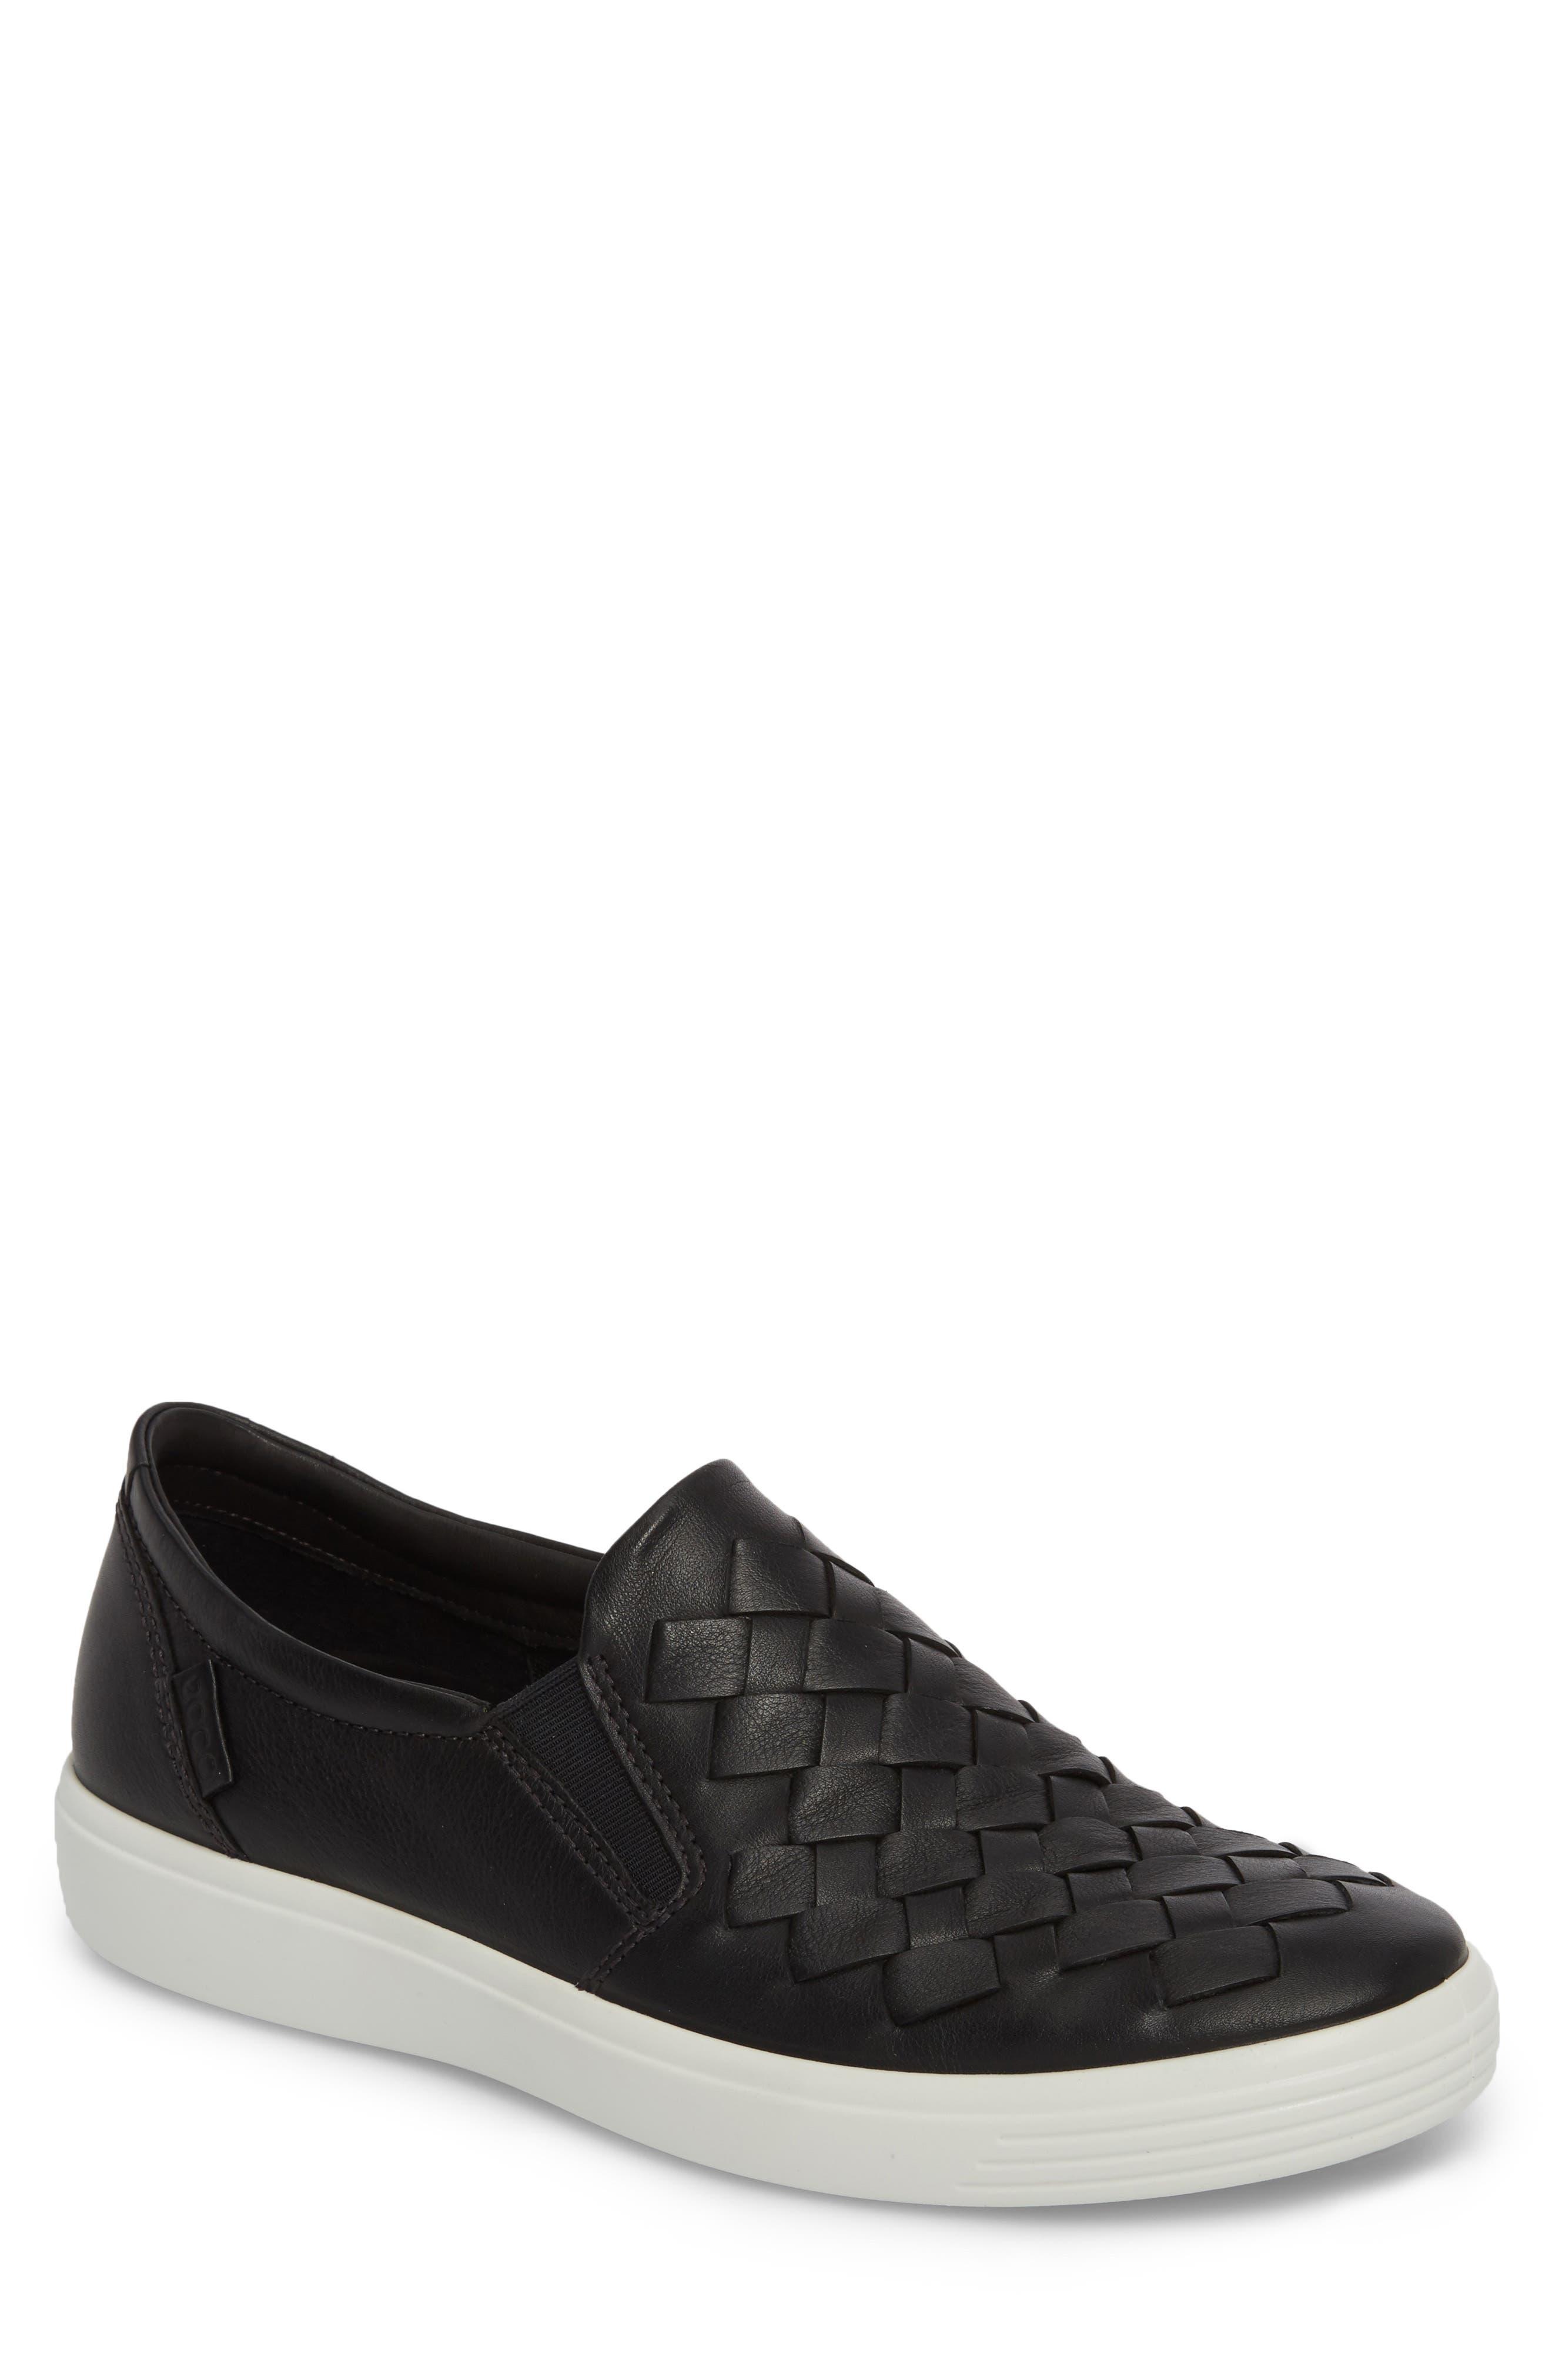 Soft 7 Woven Slip-On Sneaker,                         Main,                         color, BLACK LEATHER